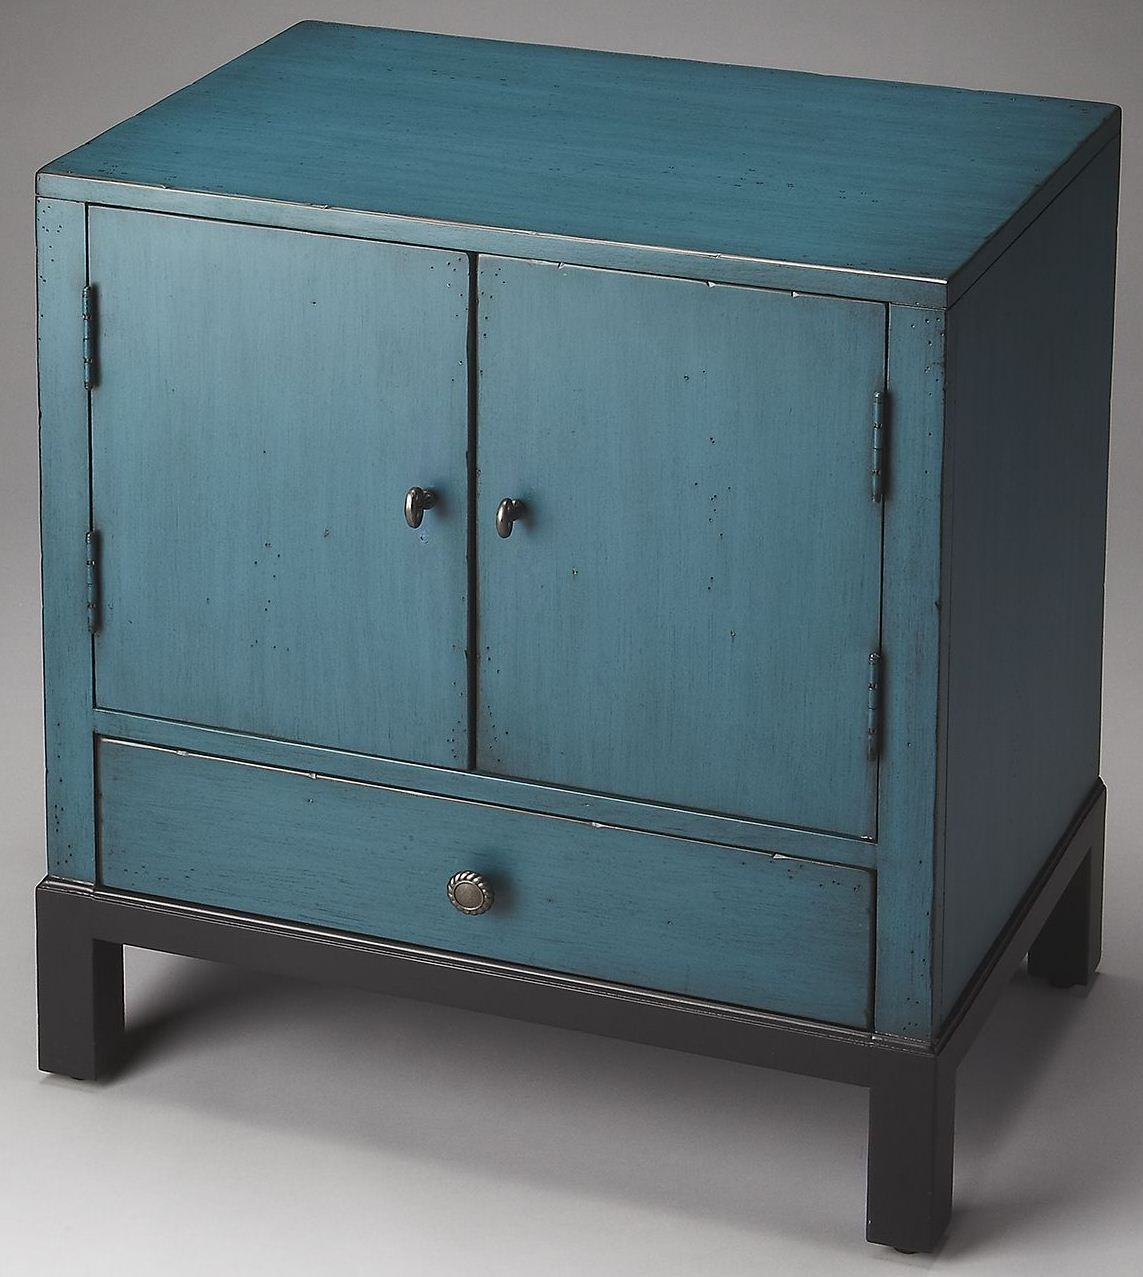 Courtland Artists Originals Distressed Blue Accent